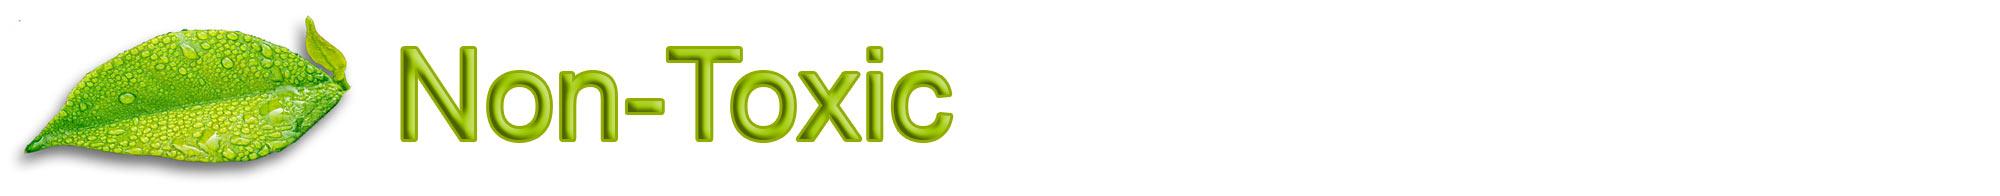 PureSafe the Non-hazardous Organic Fruit & Vegetable Multi-Surface Disinfectant Sanitizer at puresafe.net is non toxic